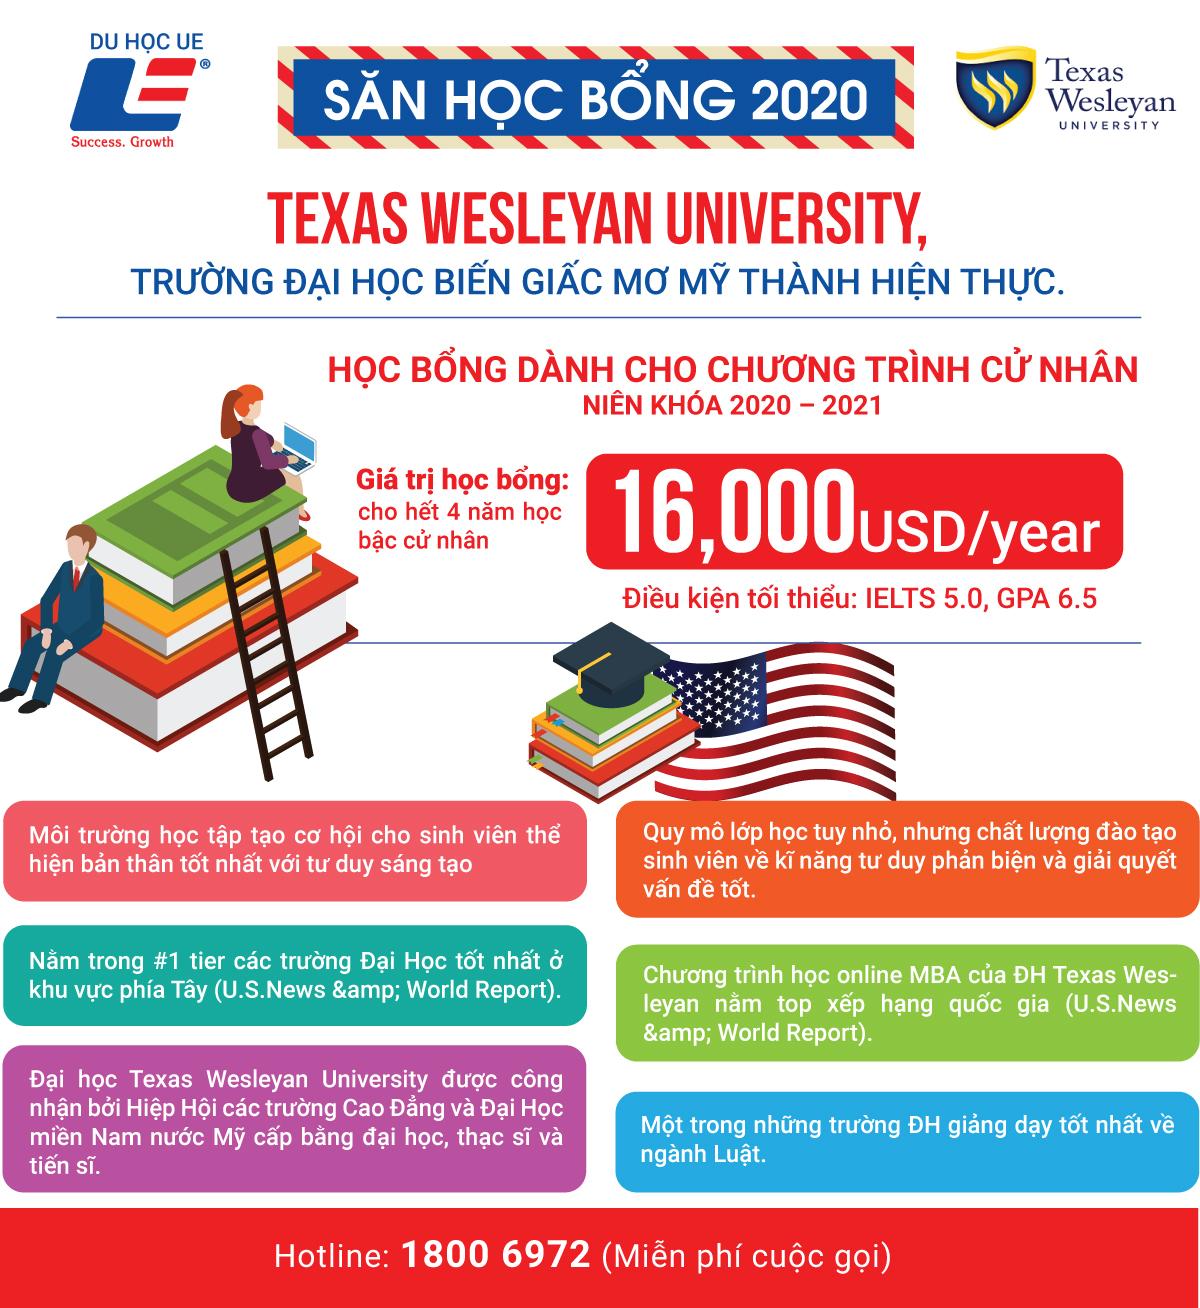 texas-wesleyan-university-truong-dai-hoc-bien-giac-mo-my-thanh-hien-thuc 2